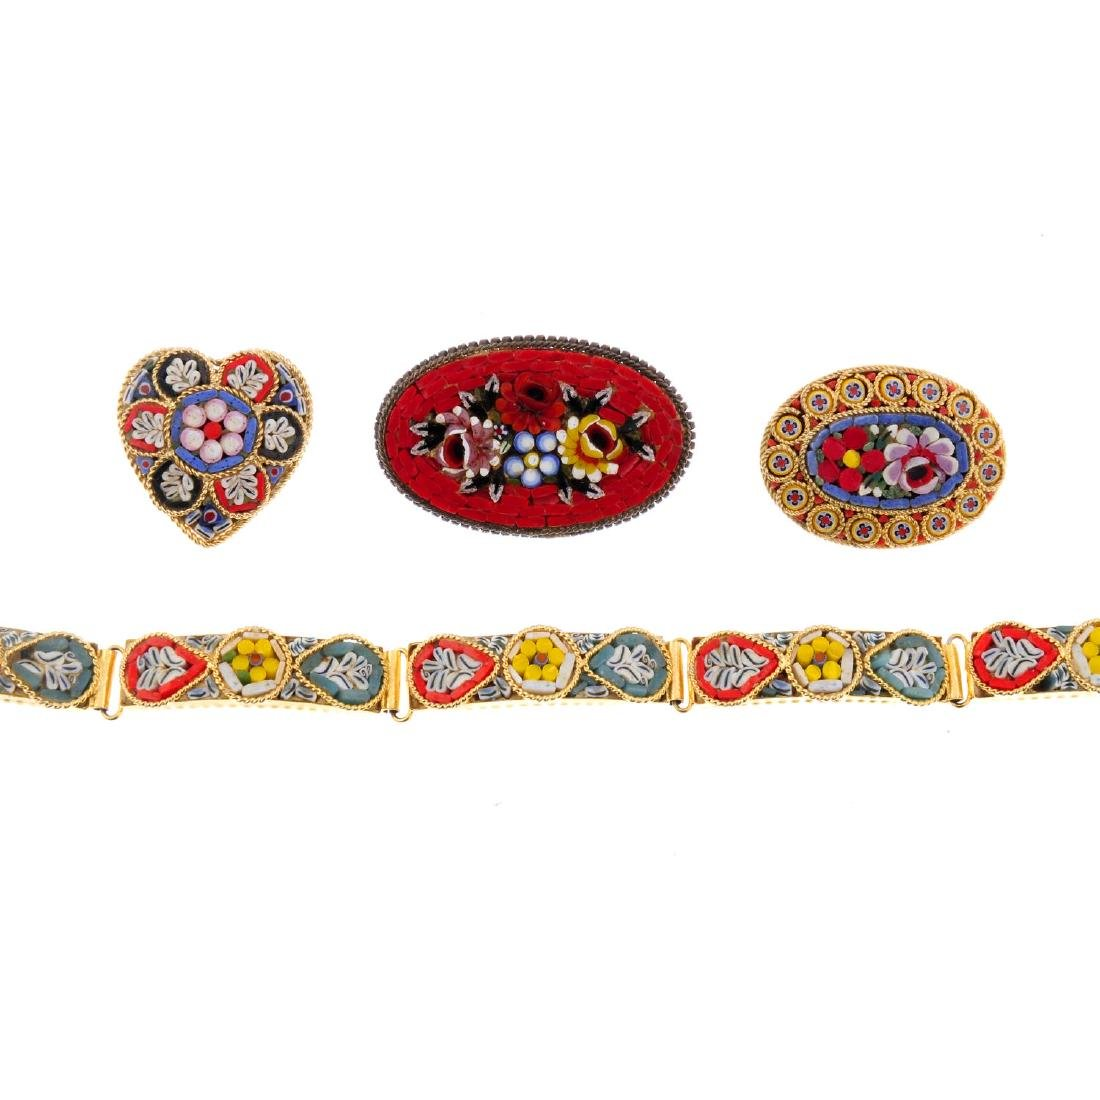 Twenty-one items of micro mosaic jewellery. To include